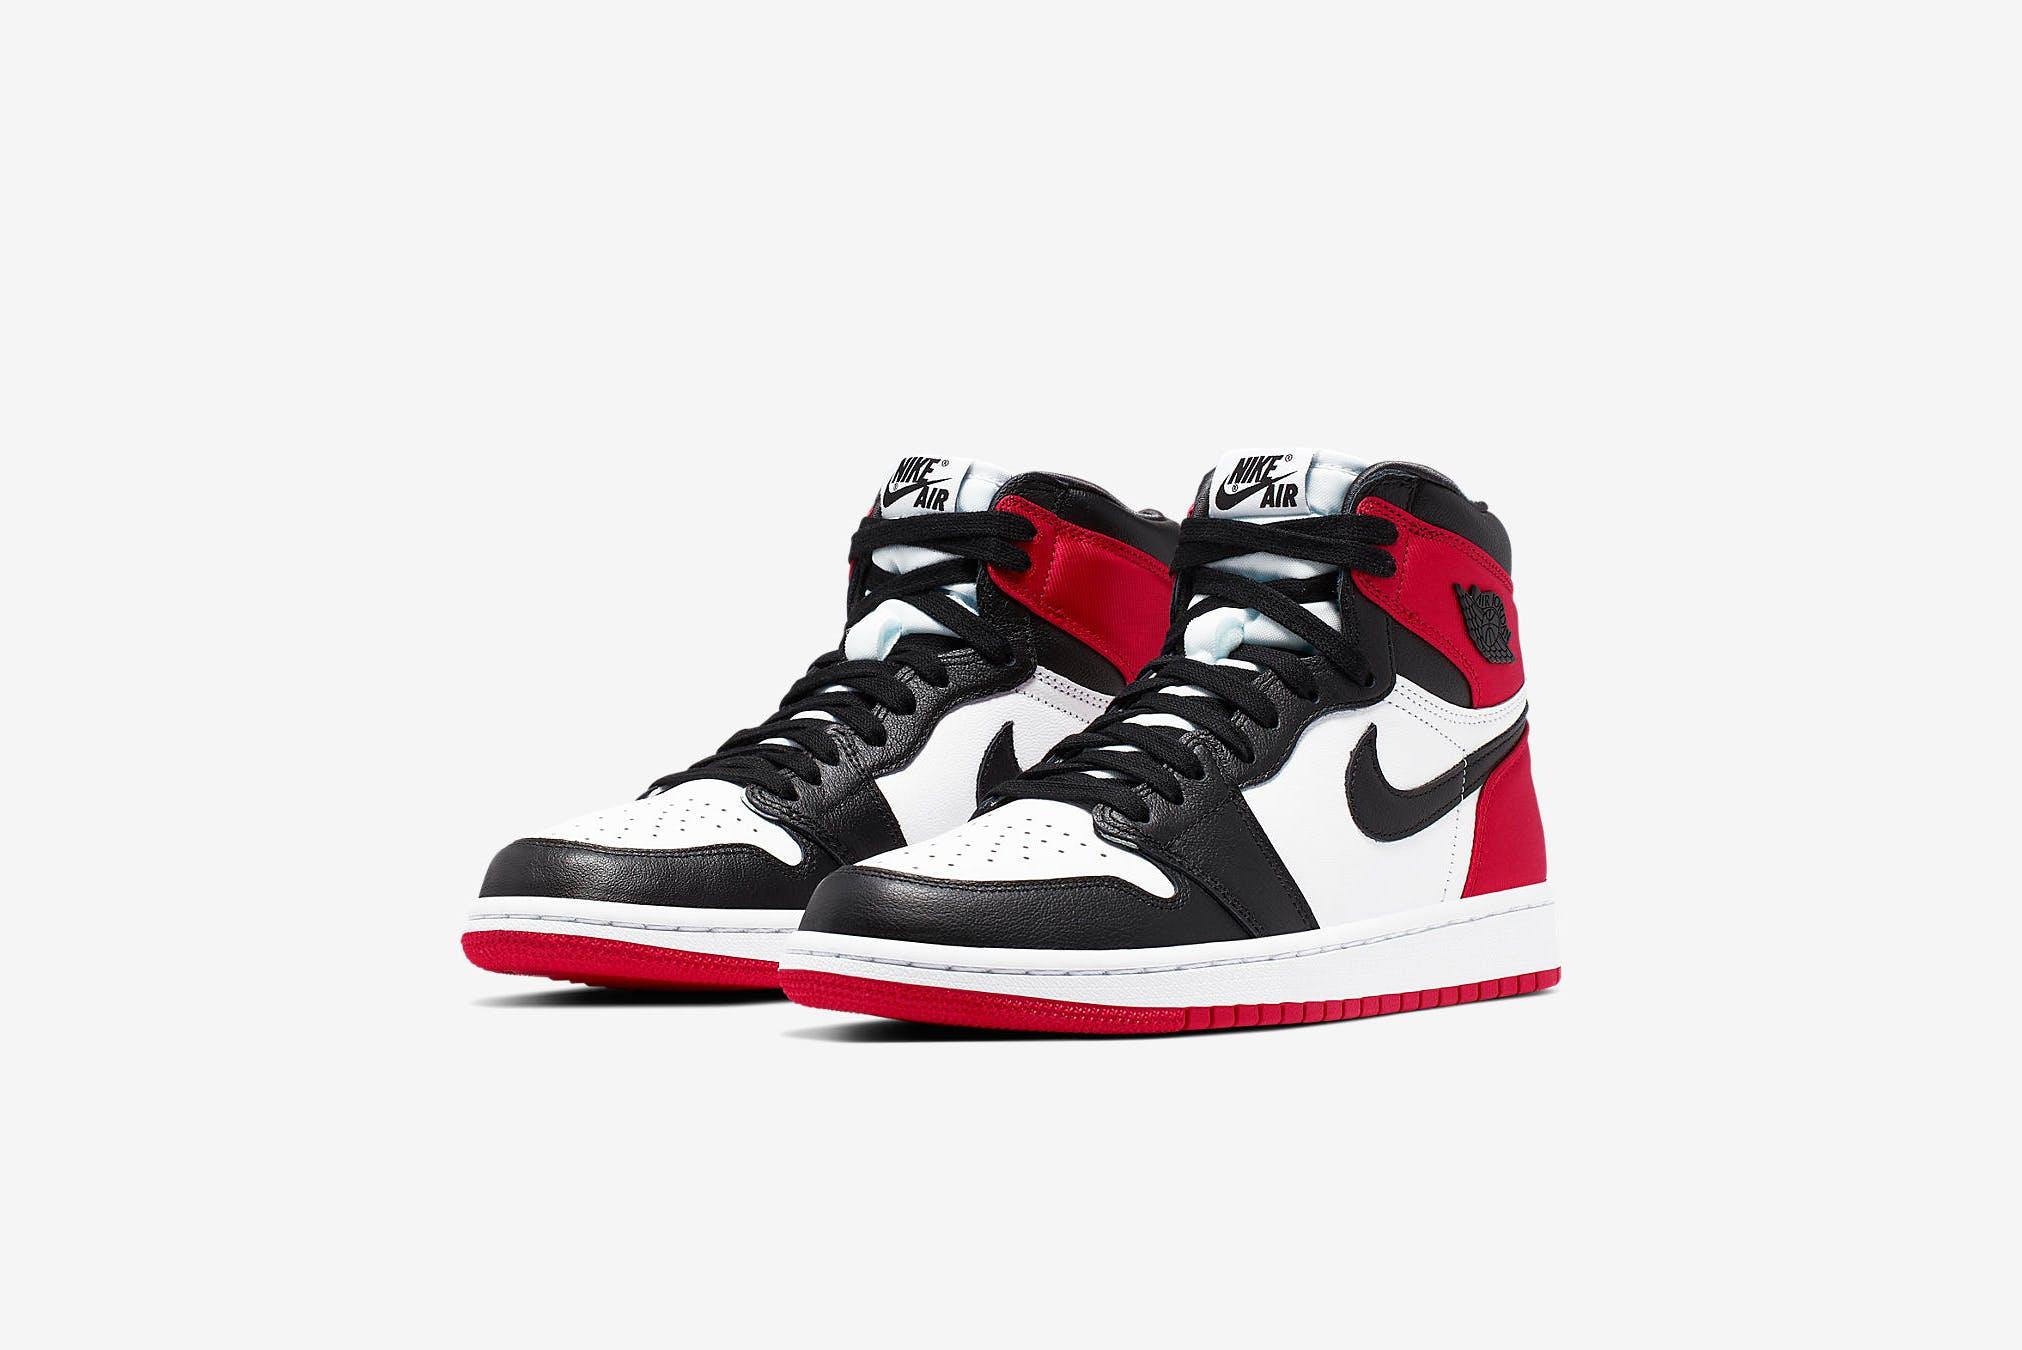 pretty cheap authentic quality quality END. Features | Nike Air Jordan 1 Retro High OG W - Register ...